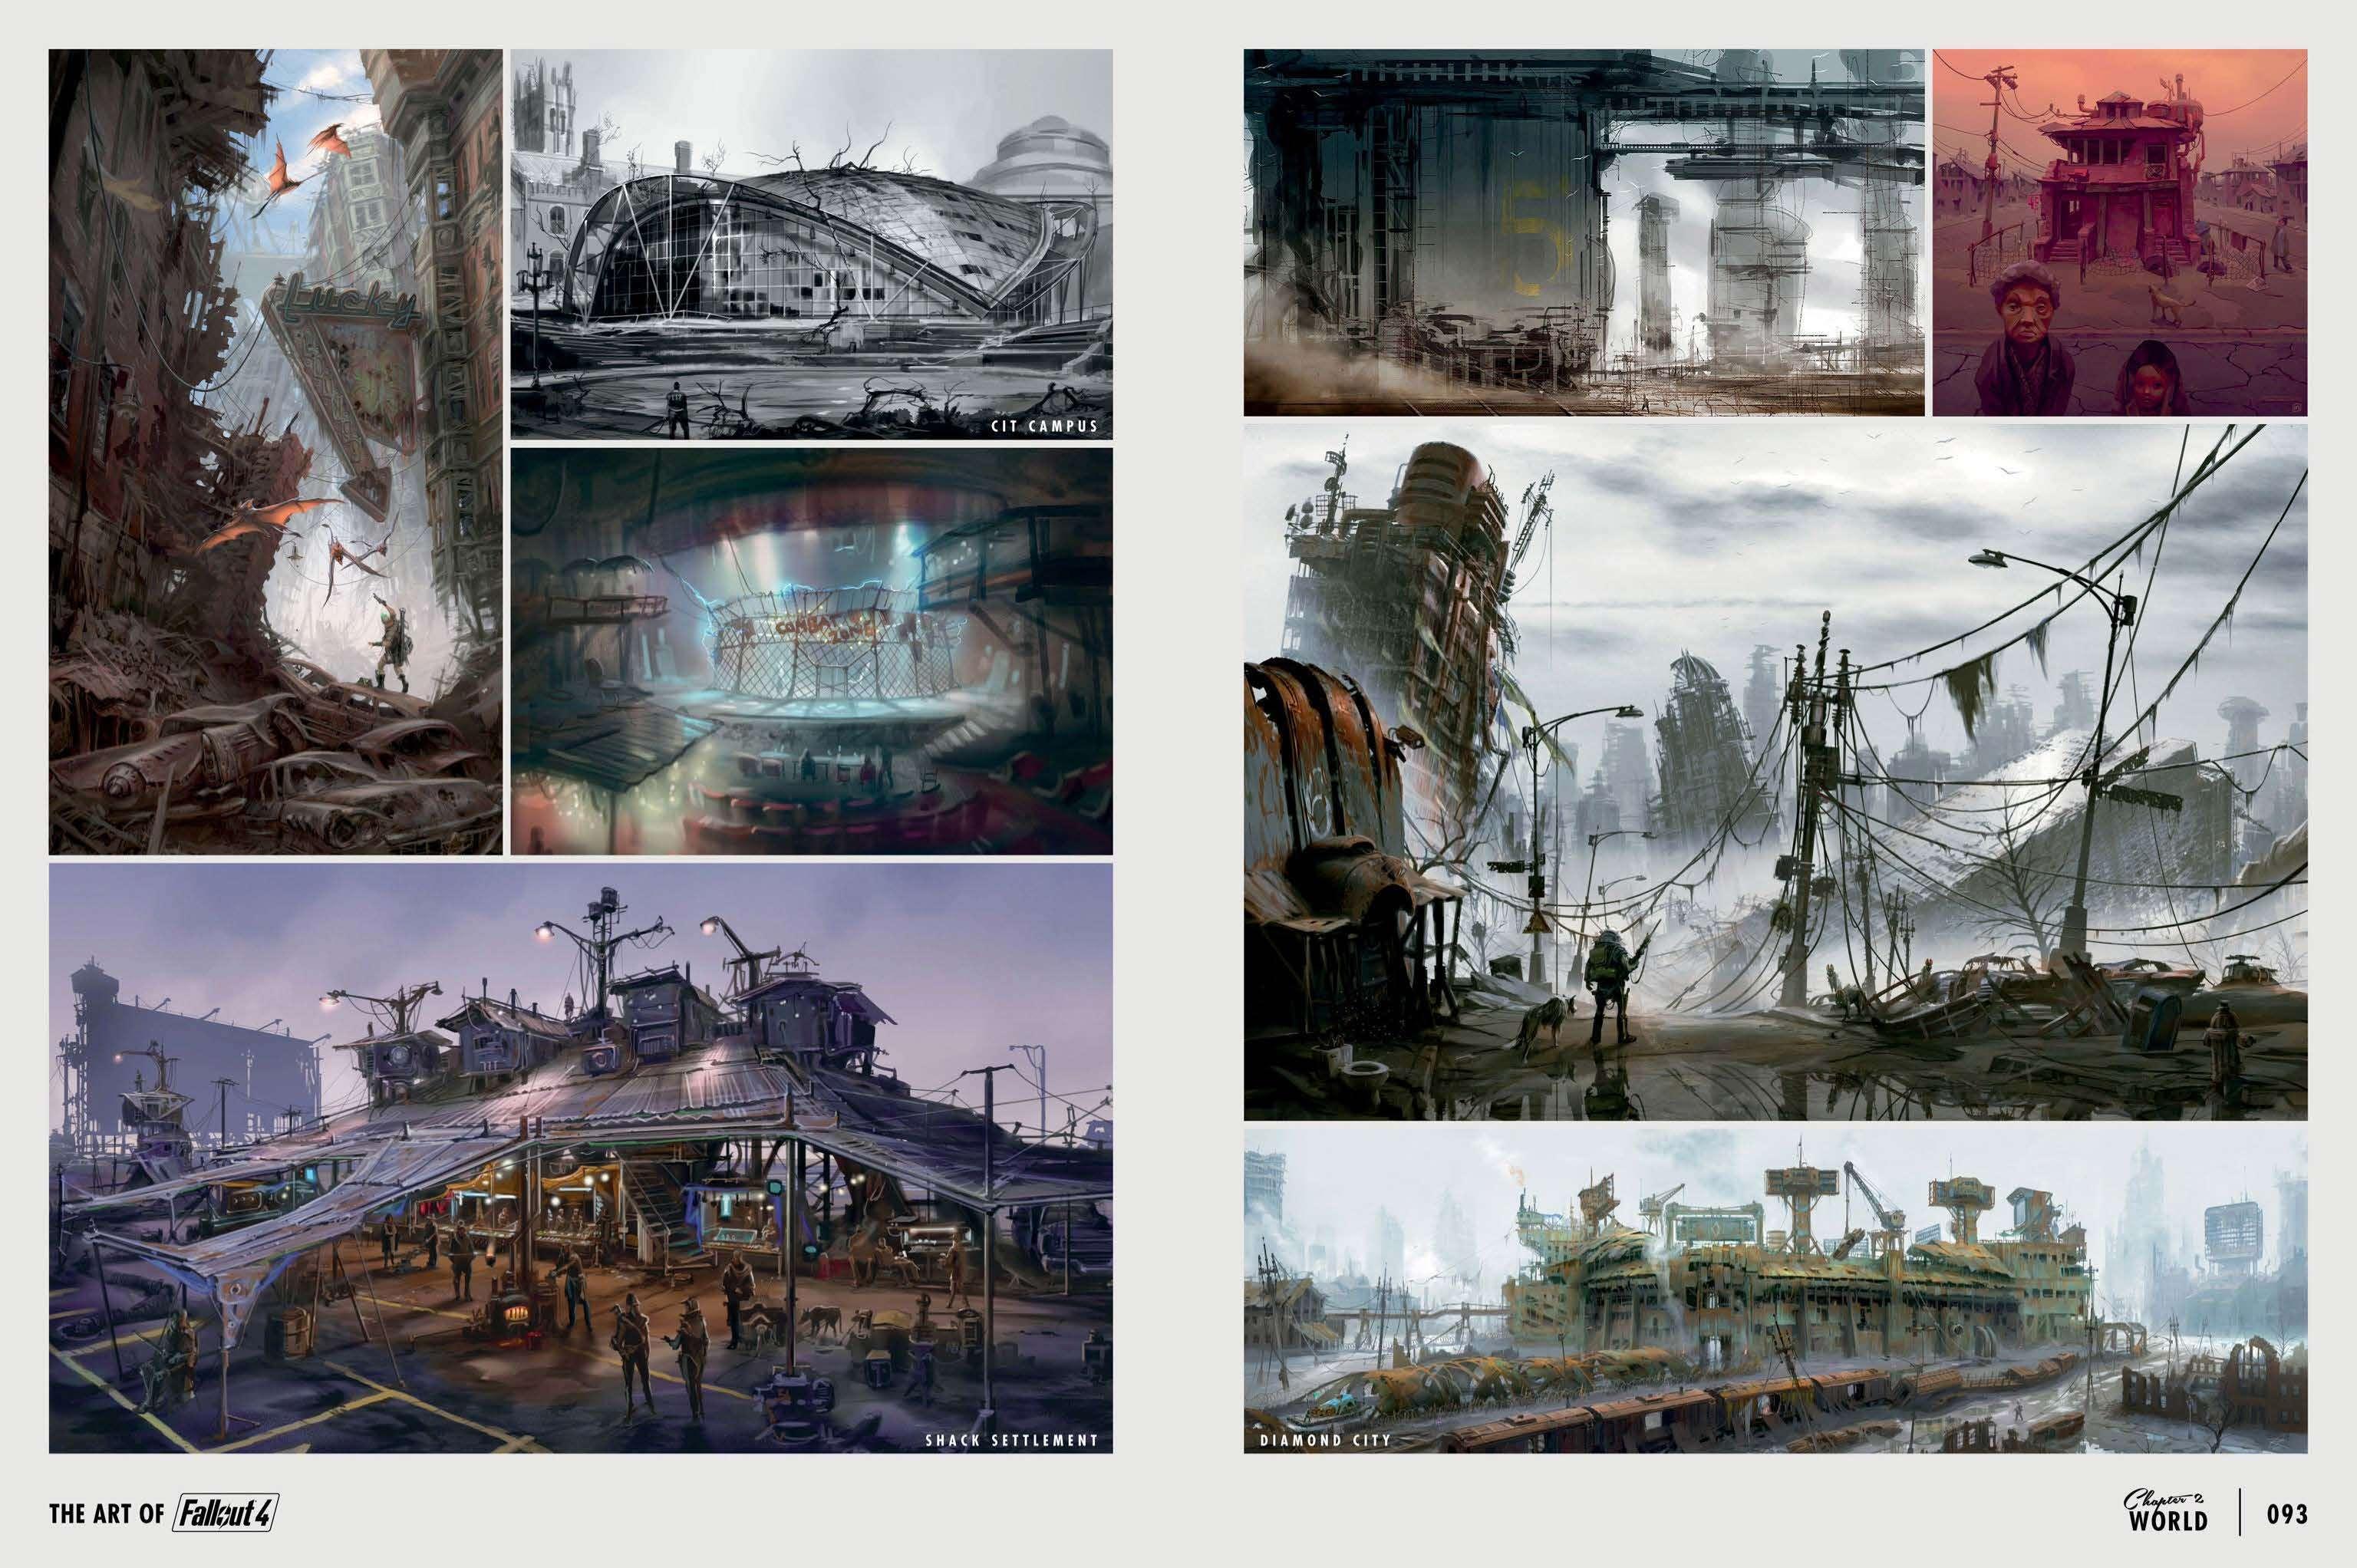 The Art of Fallout 4 - # 047 - Fallout 4 арт